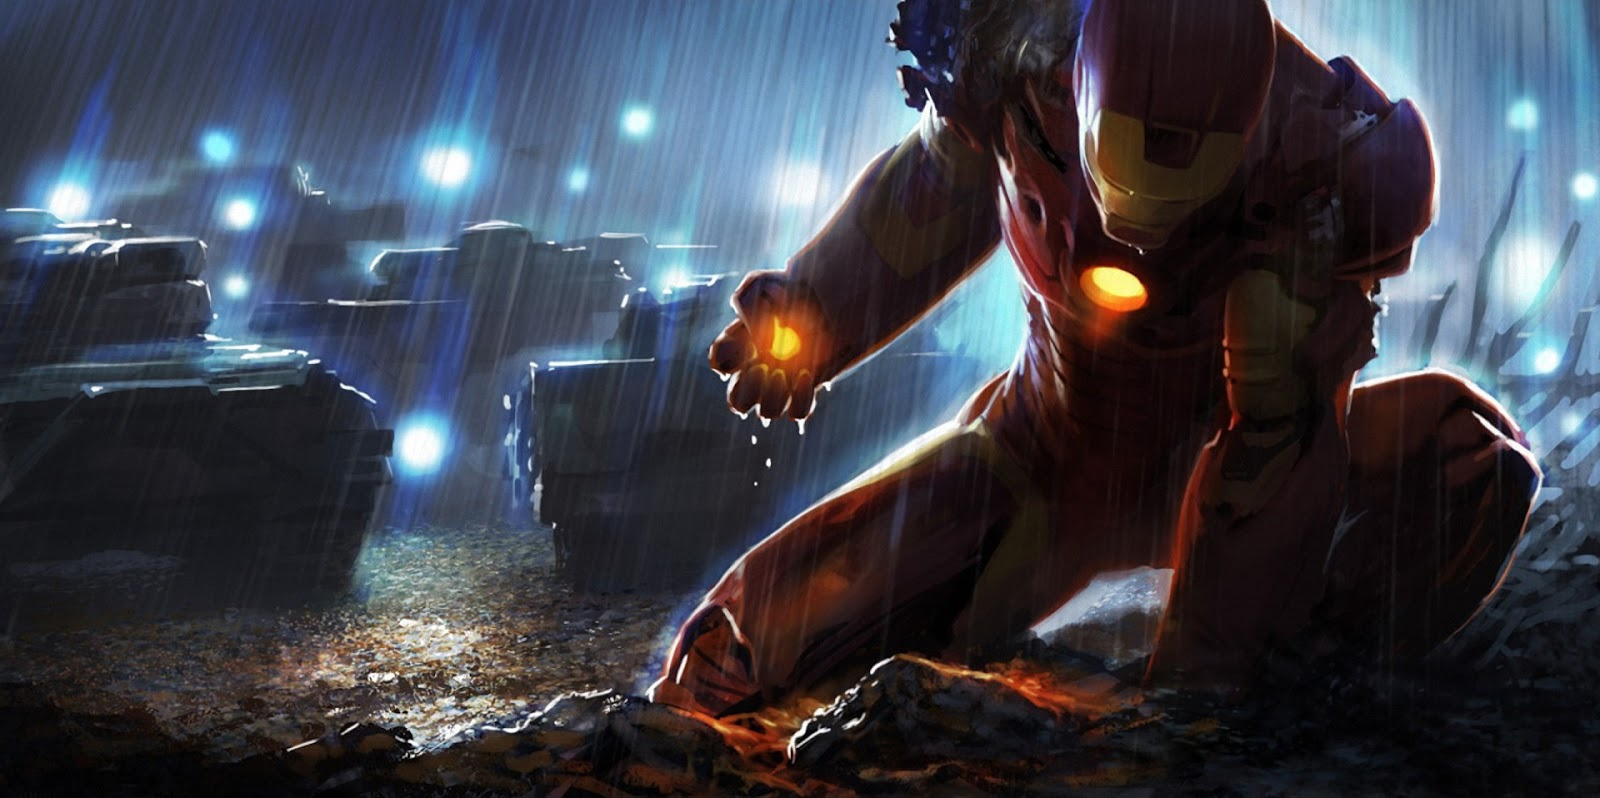 Raining Tanks HD Wallpaper Desktop PC Background a183 Iron Man 1600x798